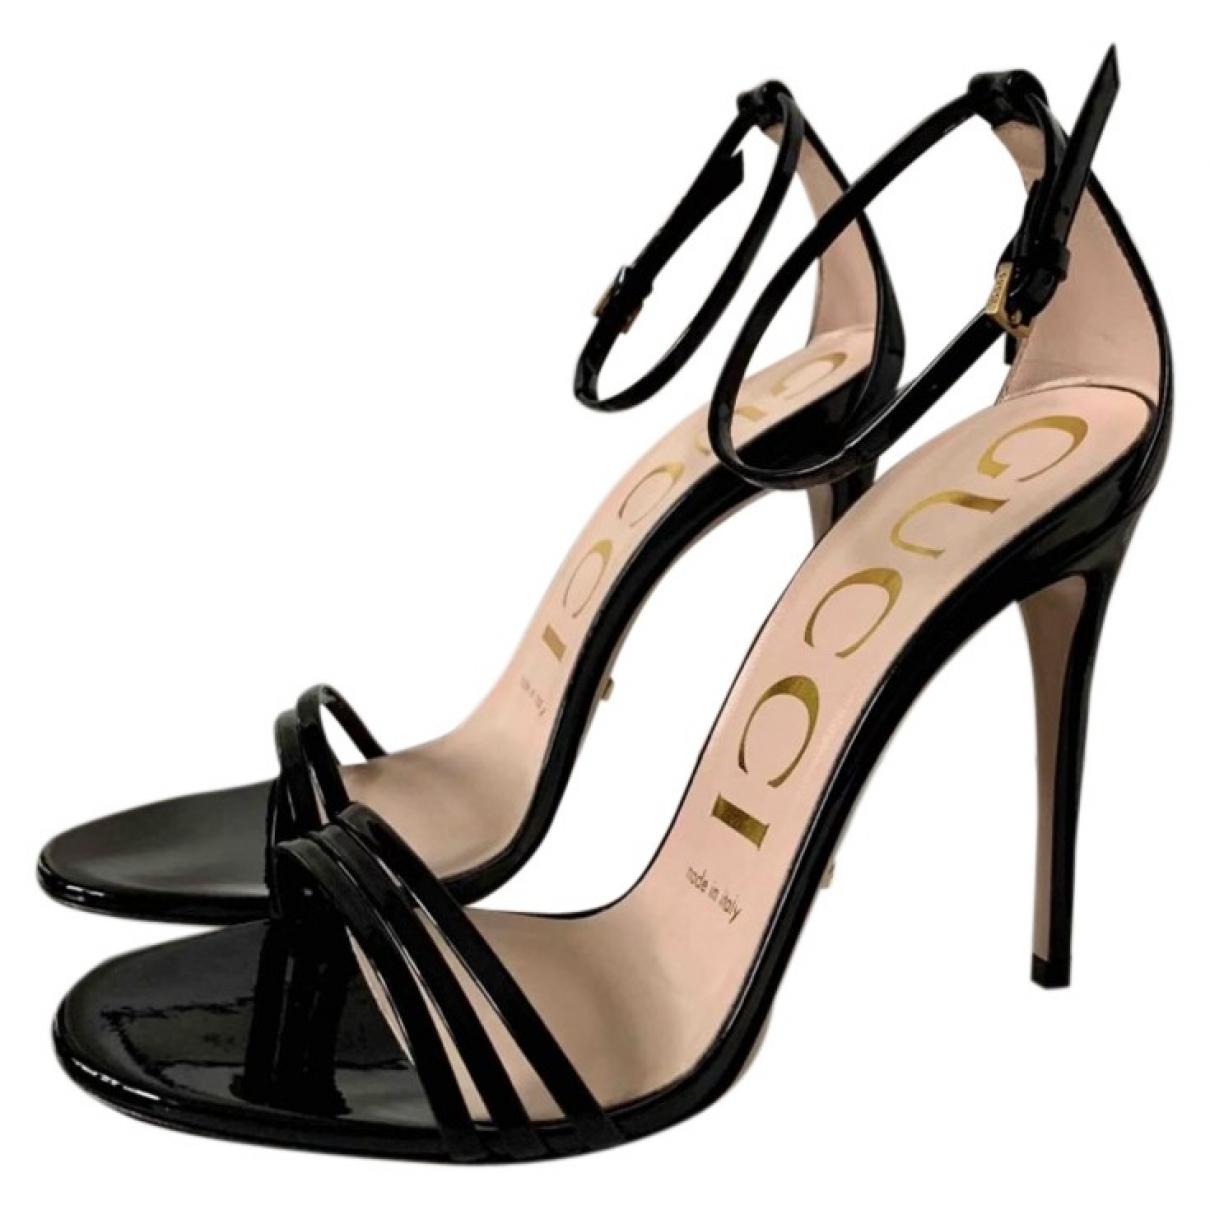 Gucci \N Sandalen in  Schwarz Lackleder